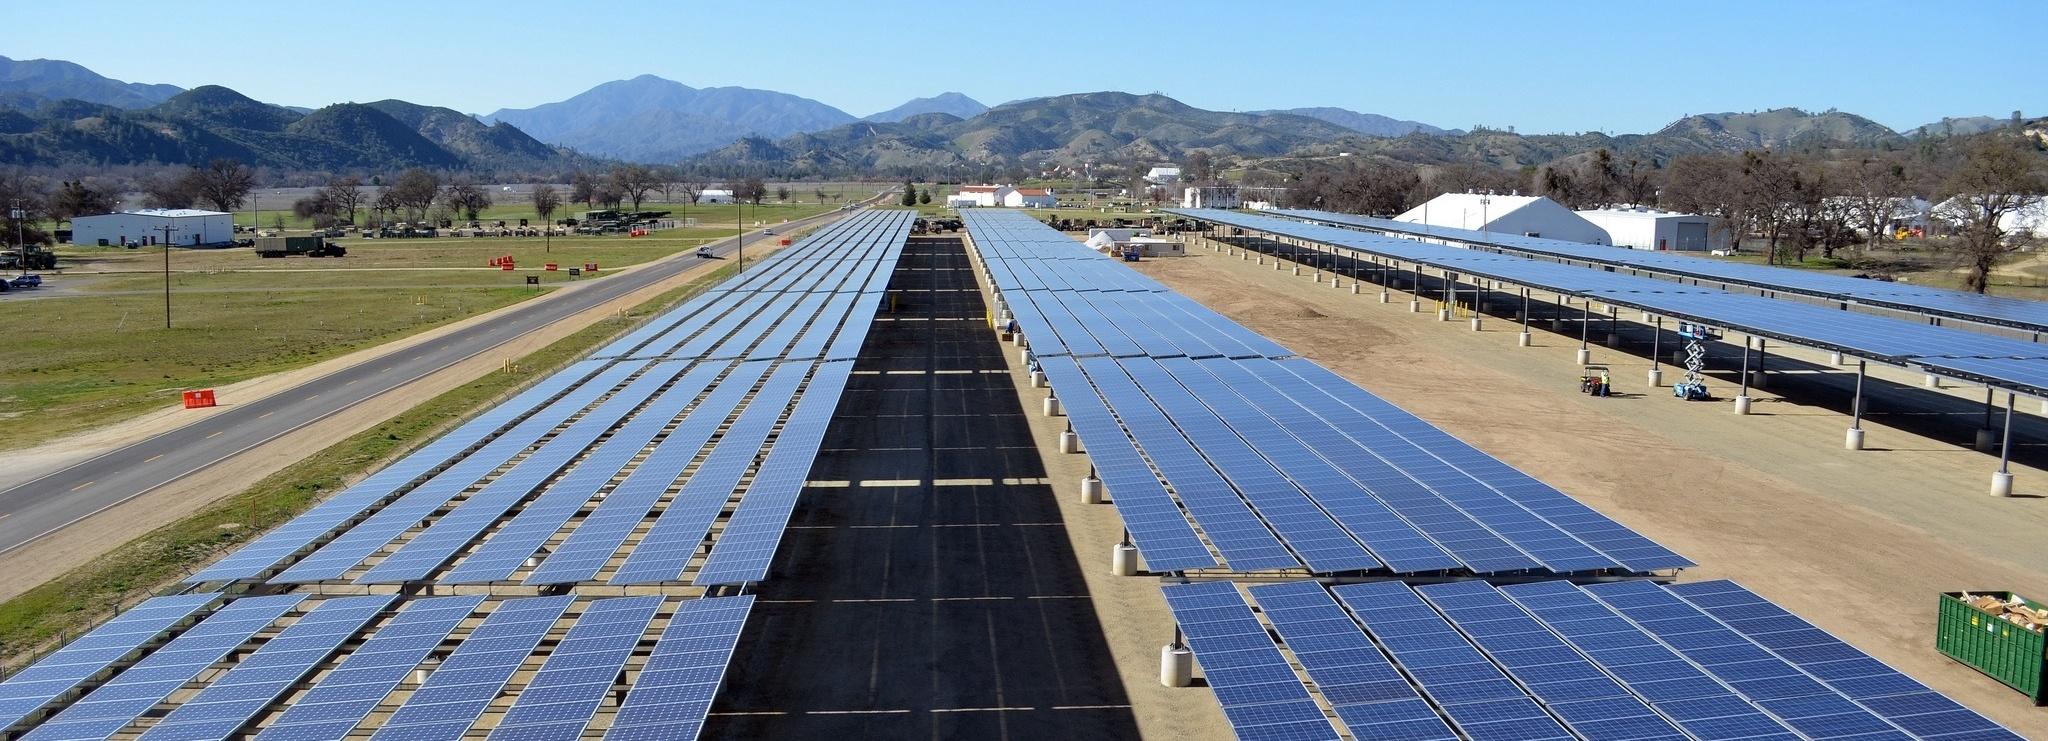 california-solar-by-usace-815821-edited